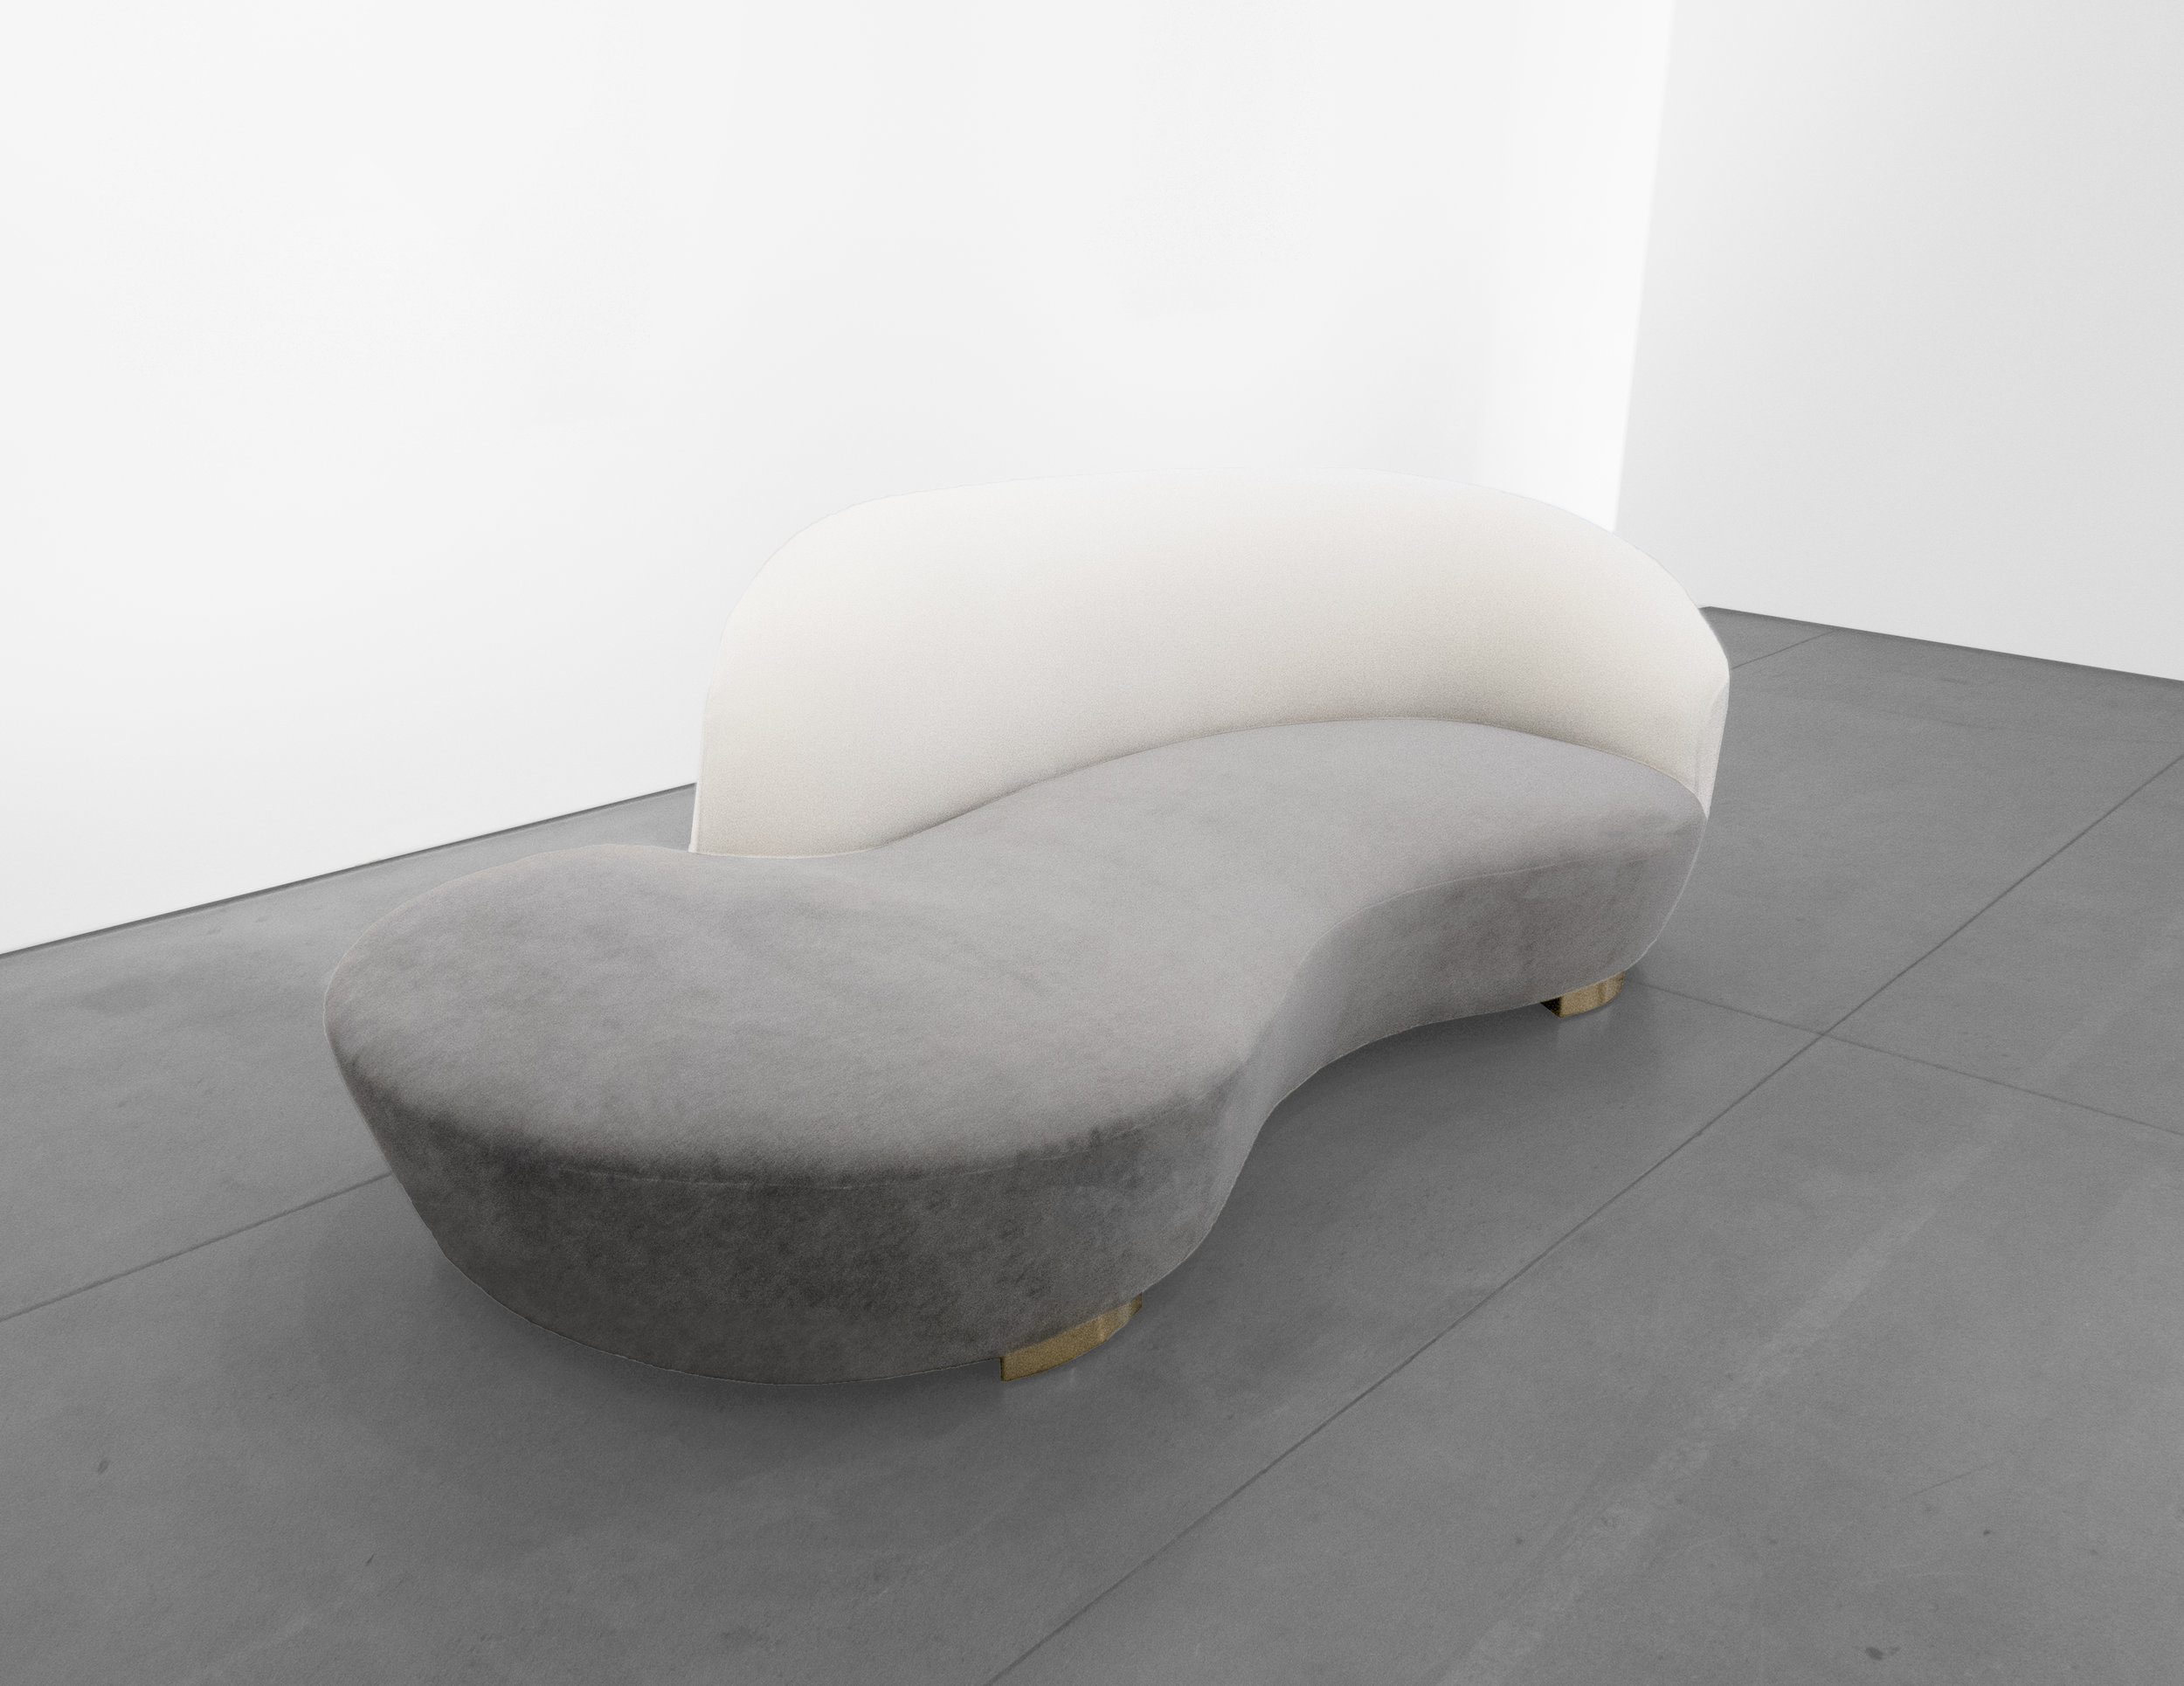 Vladimir Kagan, 'Cloud' Sofa, c. 1970 - 1979, Wood, Dedar Milano Upholstery, 32.5 H x 98 W x 16 D incehs_8.jpg